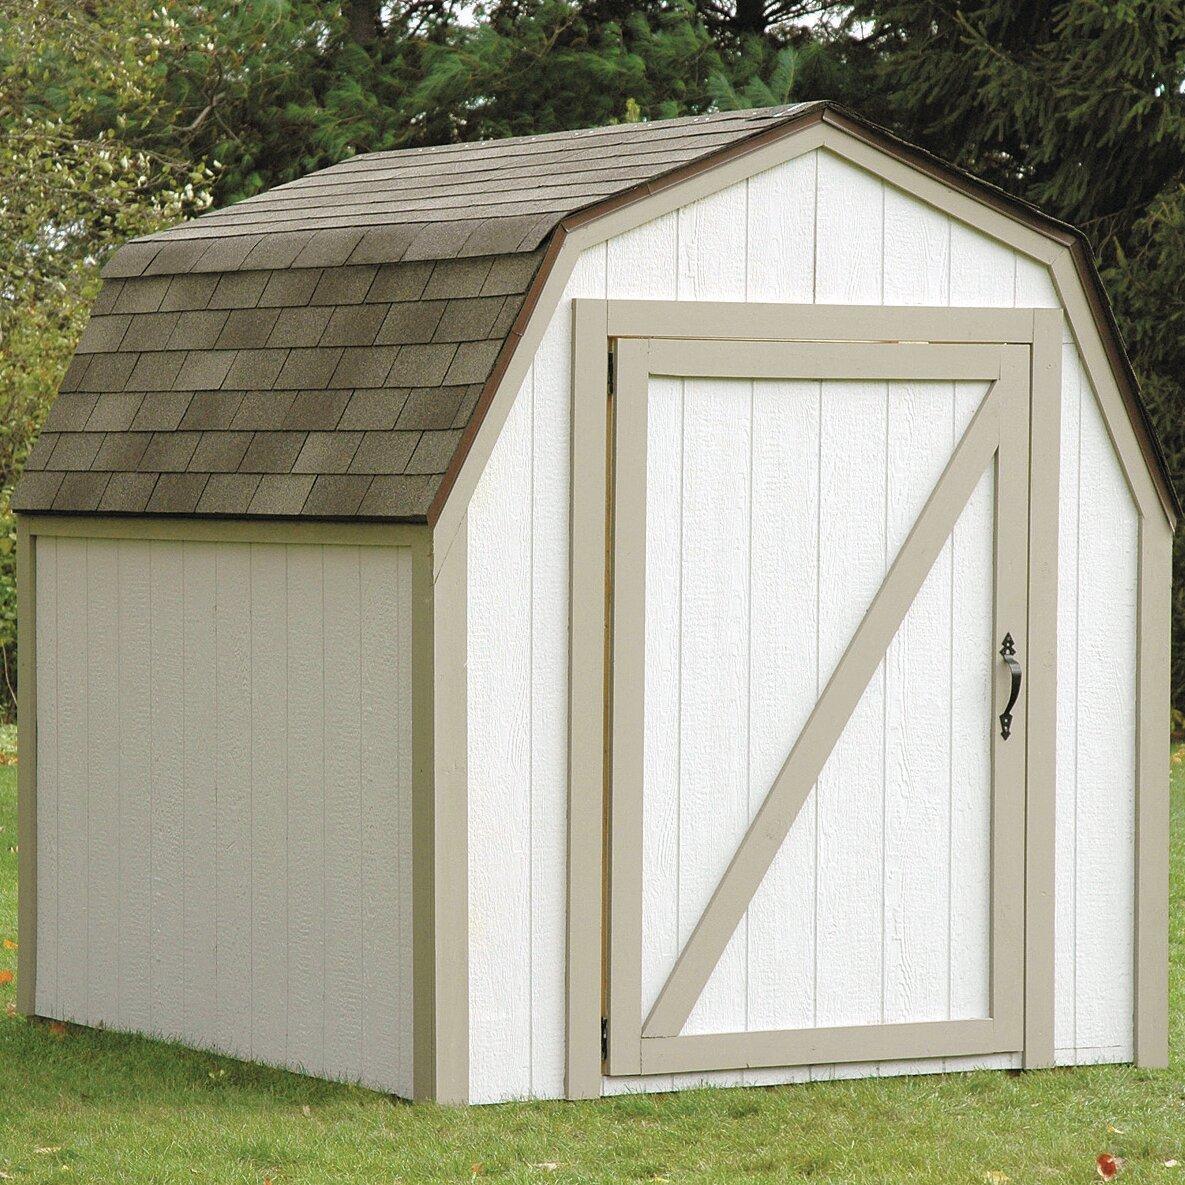 2x4 Basics Barn Roof 7 Ft. W X 8 Ft. D Storage Shed Kit Brackets & Reviews